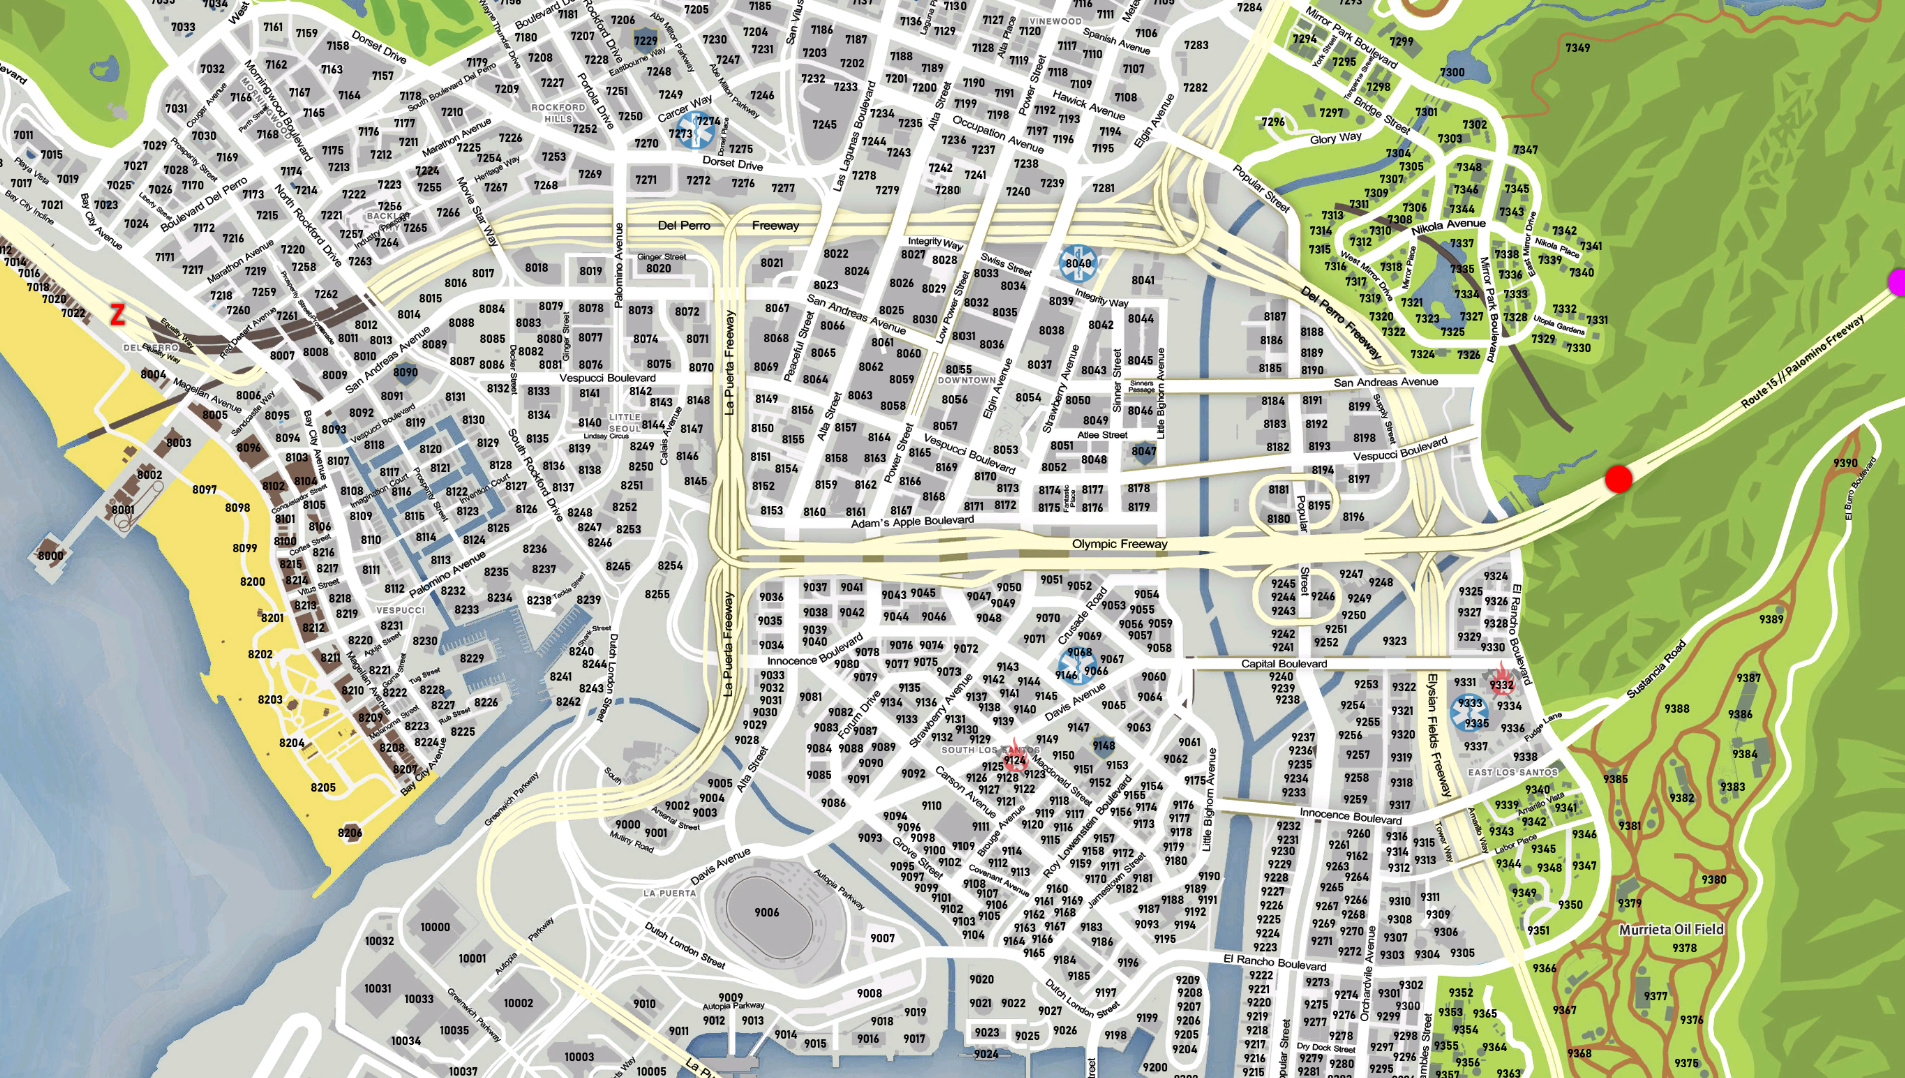 Release] Postal Code Map - New & Improved - v1 1 - Releases